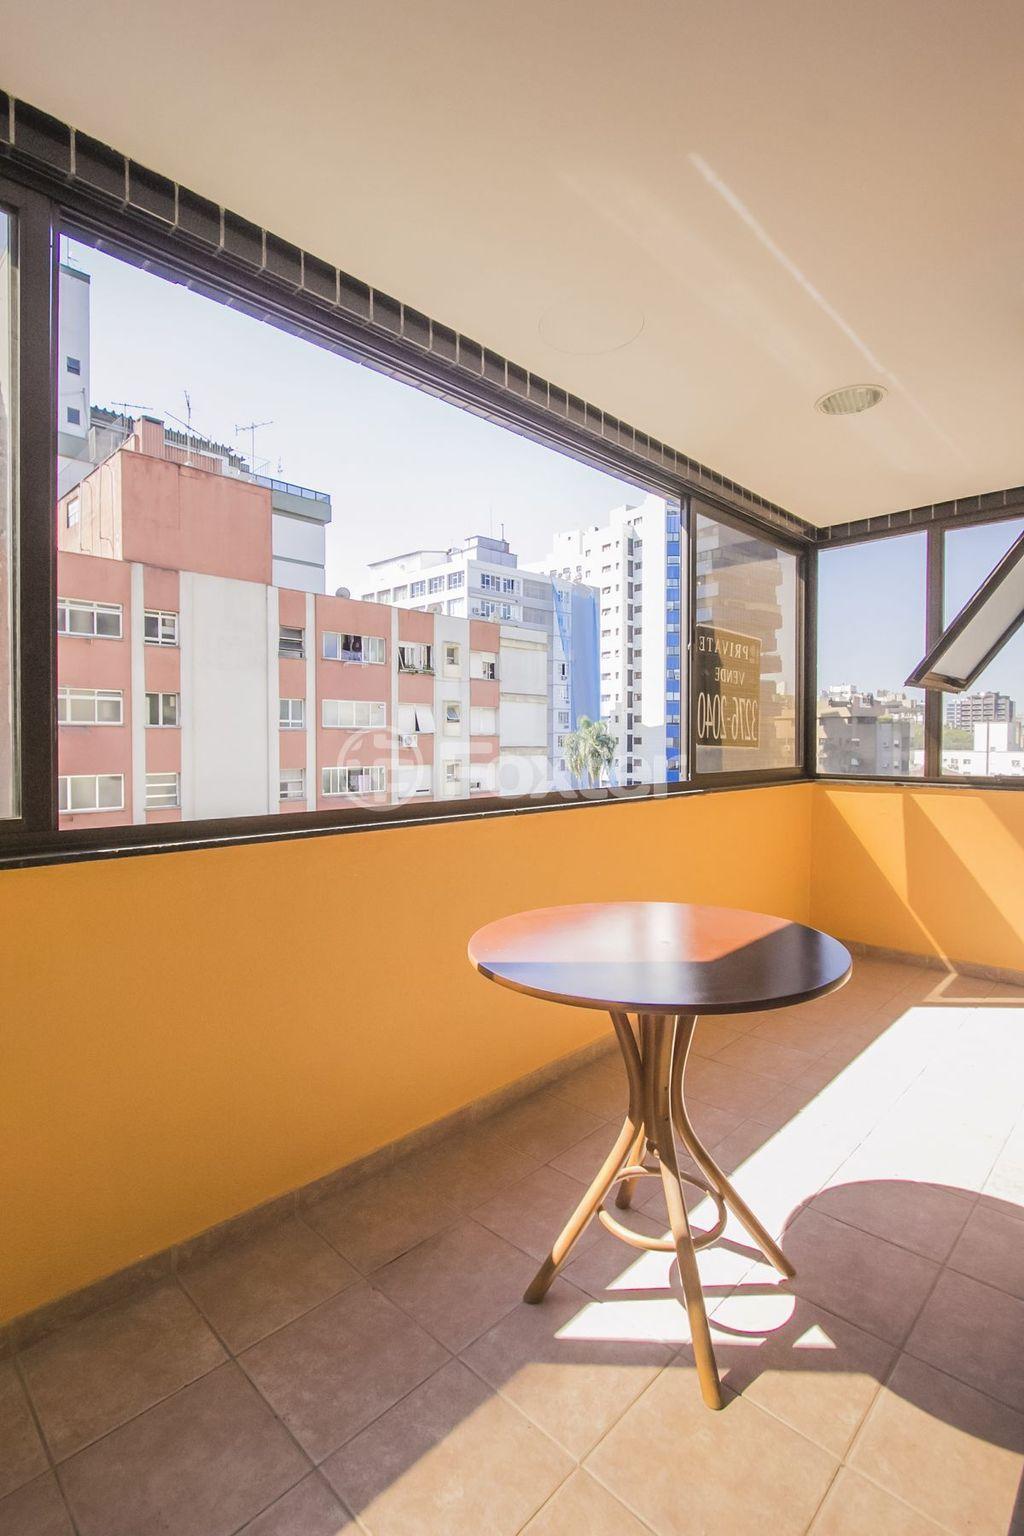 Apto 1 Dorm, Independência, Porto Alegre (121883) - Foto 14